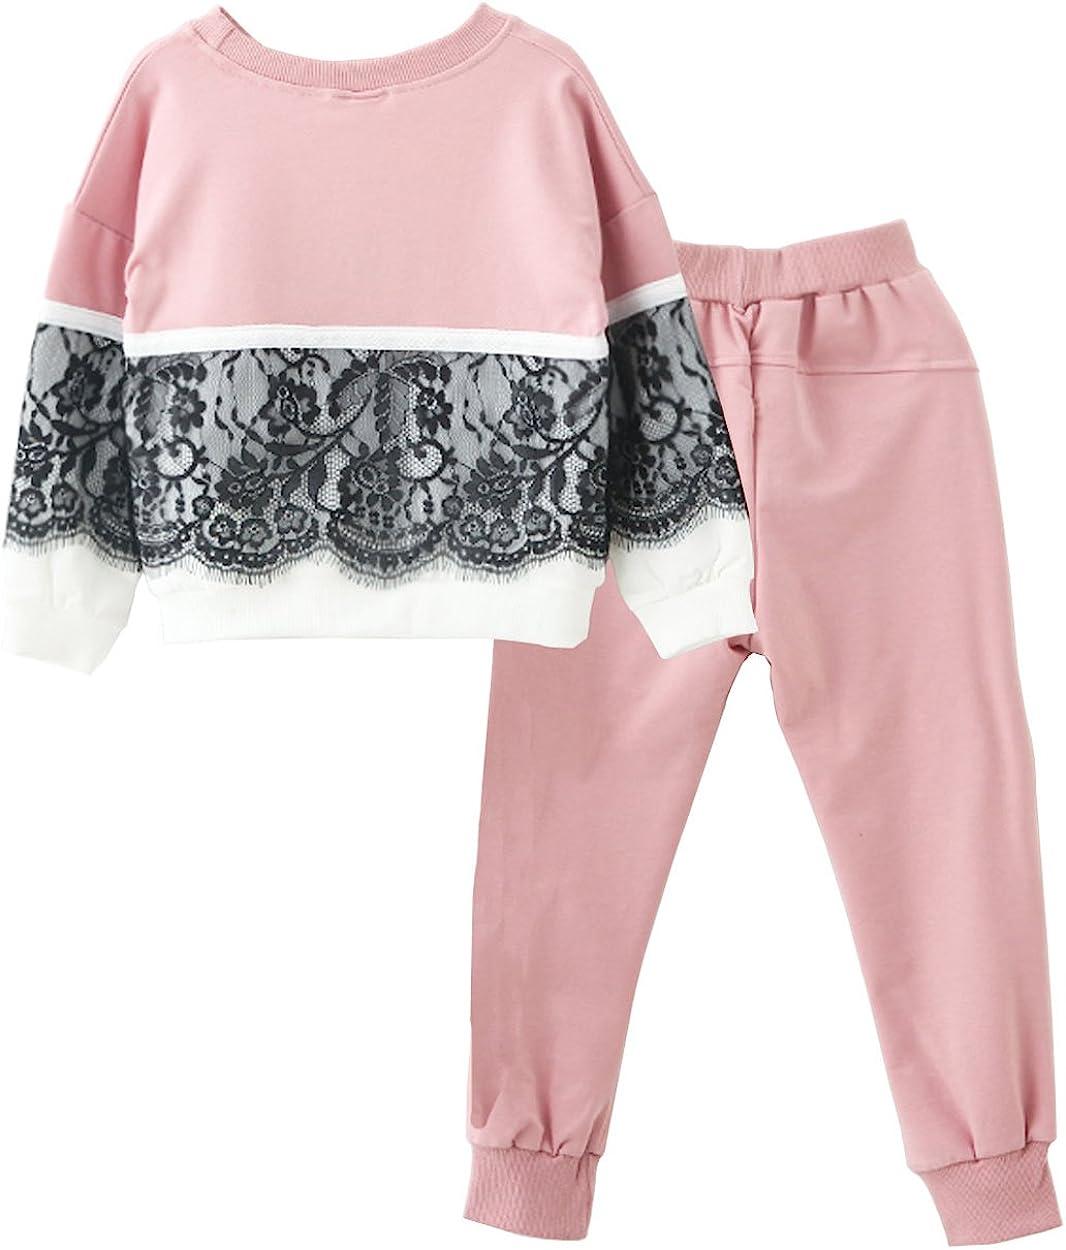 Little Girls Kids 2 Pieces Long Sleeve Top Pants Leggings Clothes Set Outfits